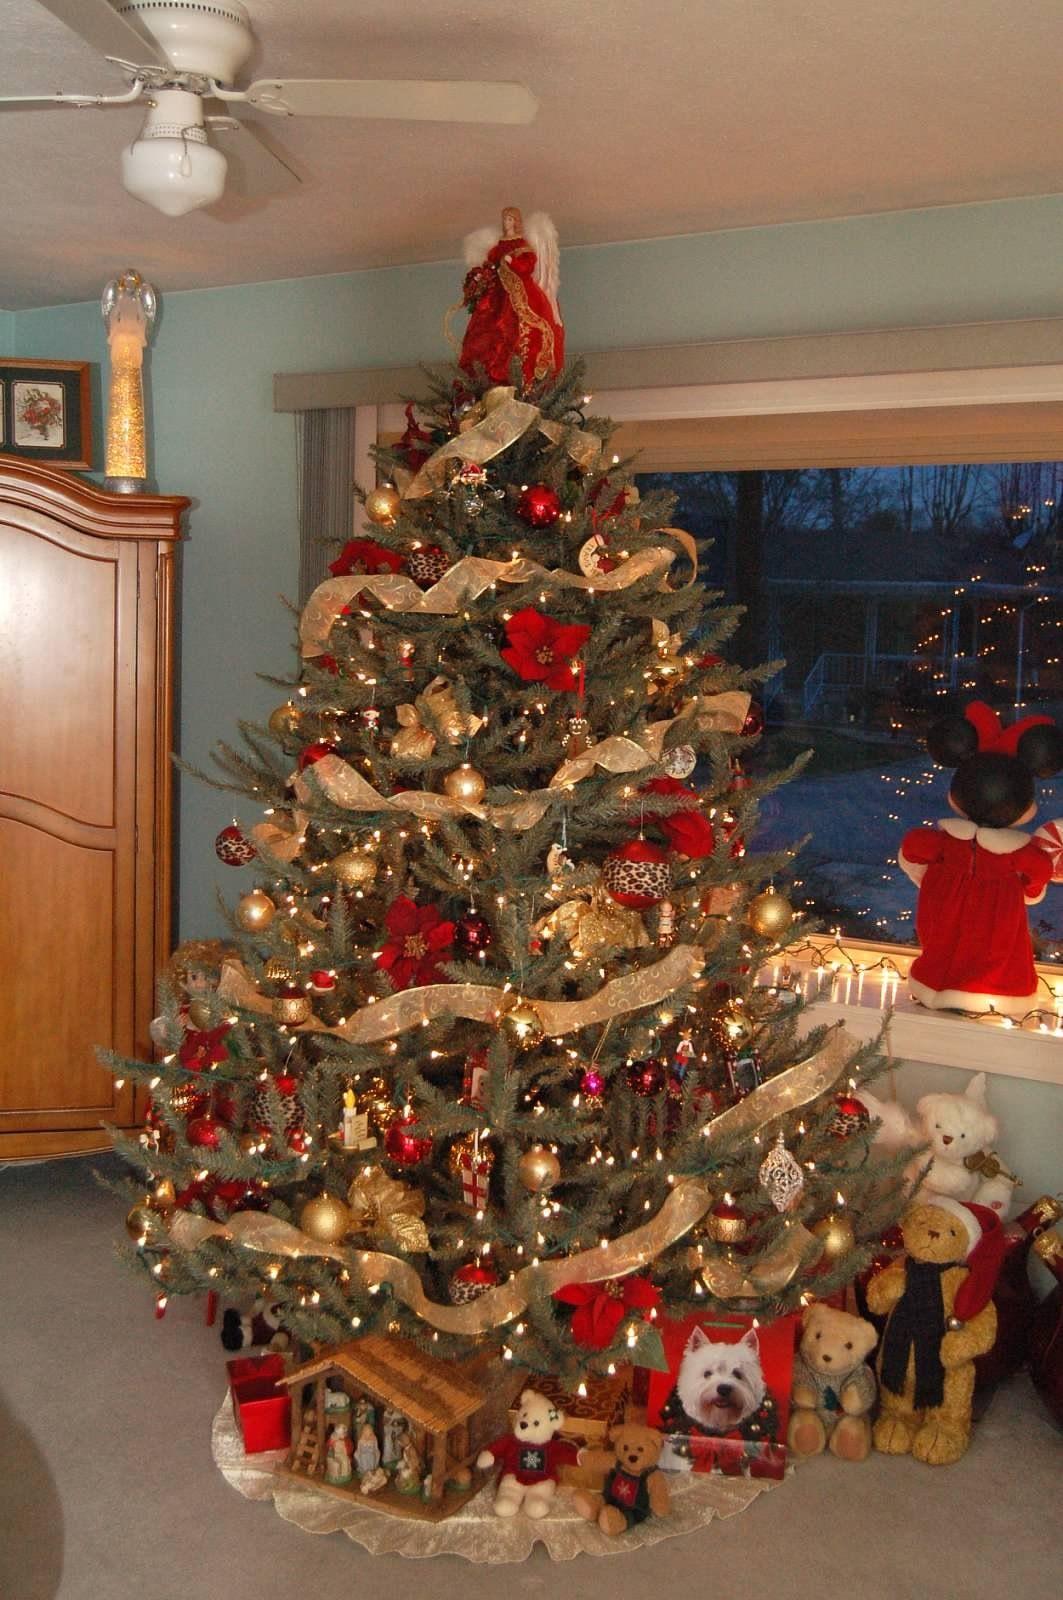 Cheetah Christmas Tree By Chrisy S Creations Christmas Tree Christmas Tree Decorations Christmas